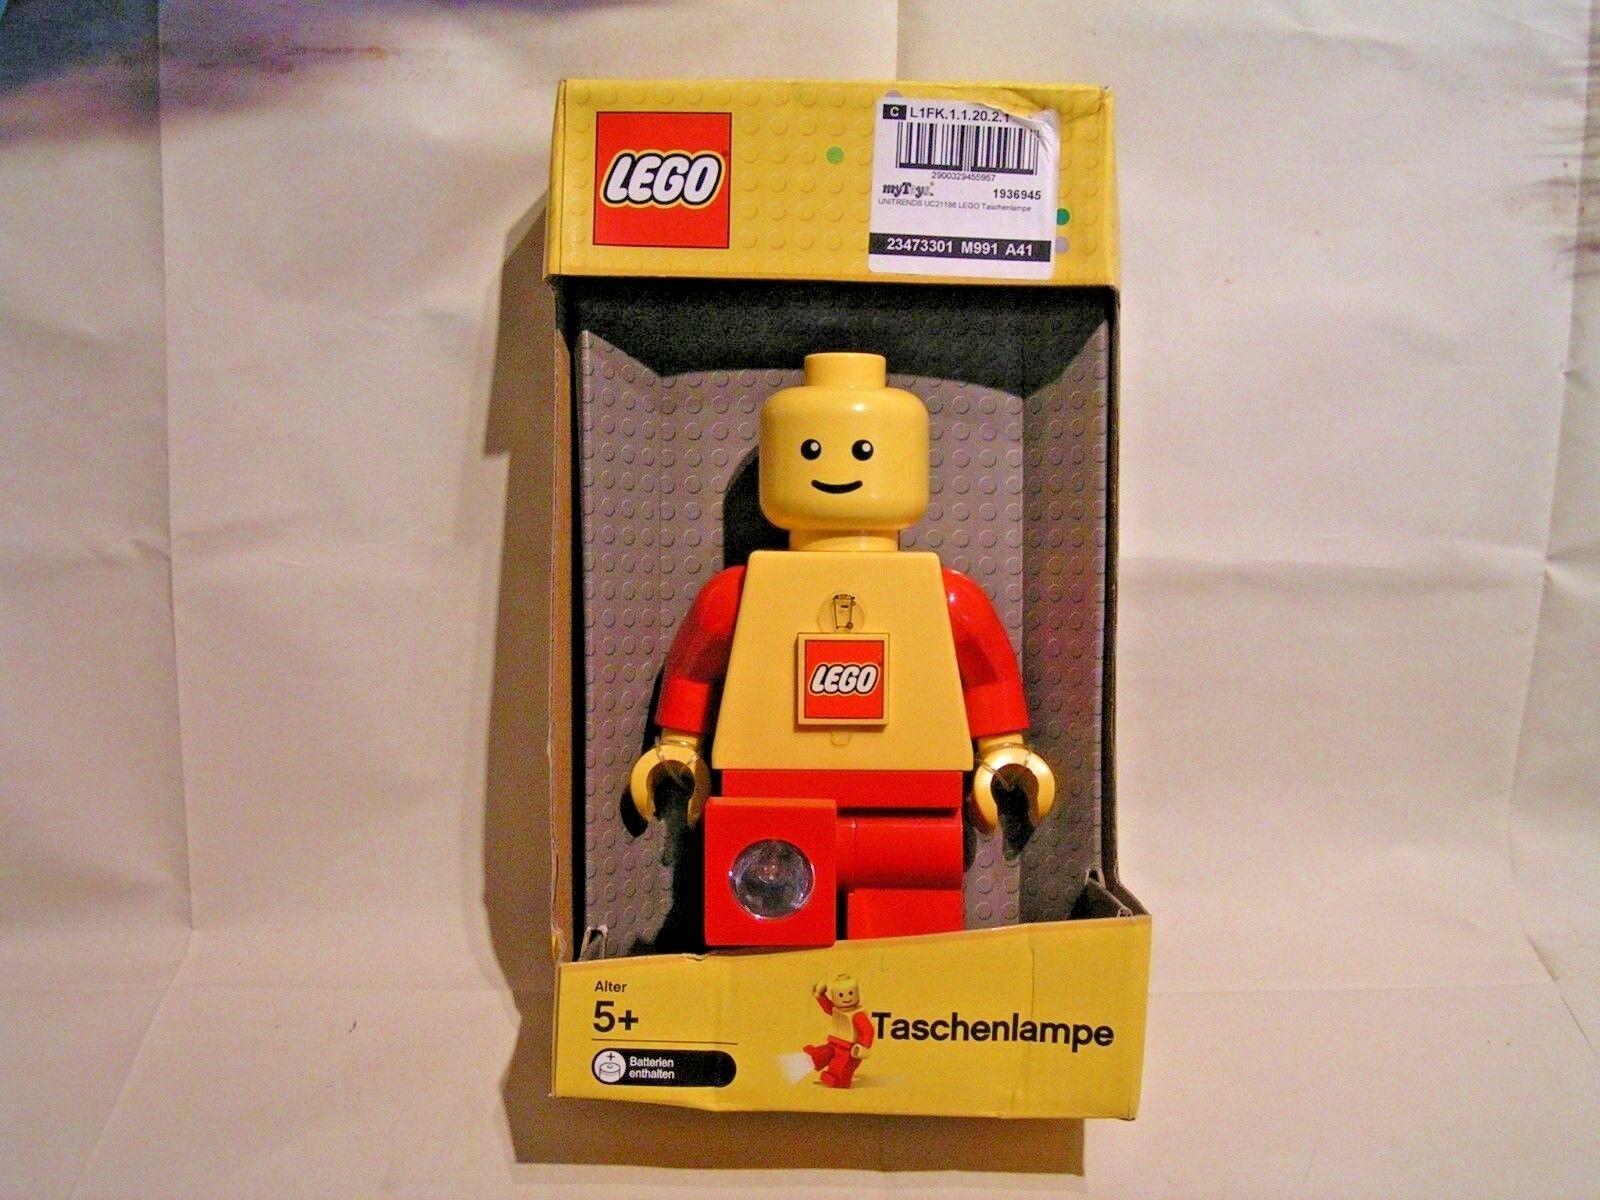 LEGO - LAMPE TORCHE MAXIFIG    (ref. 21186)  EN BOÎTE 54c6b4